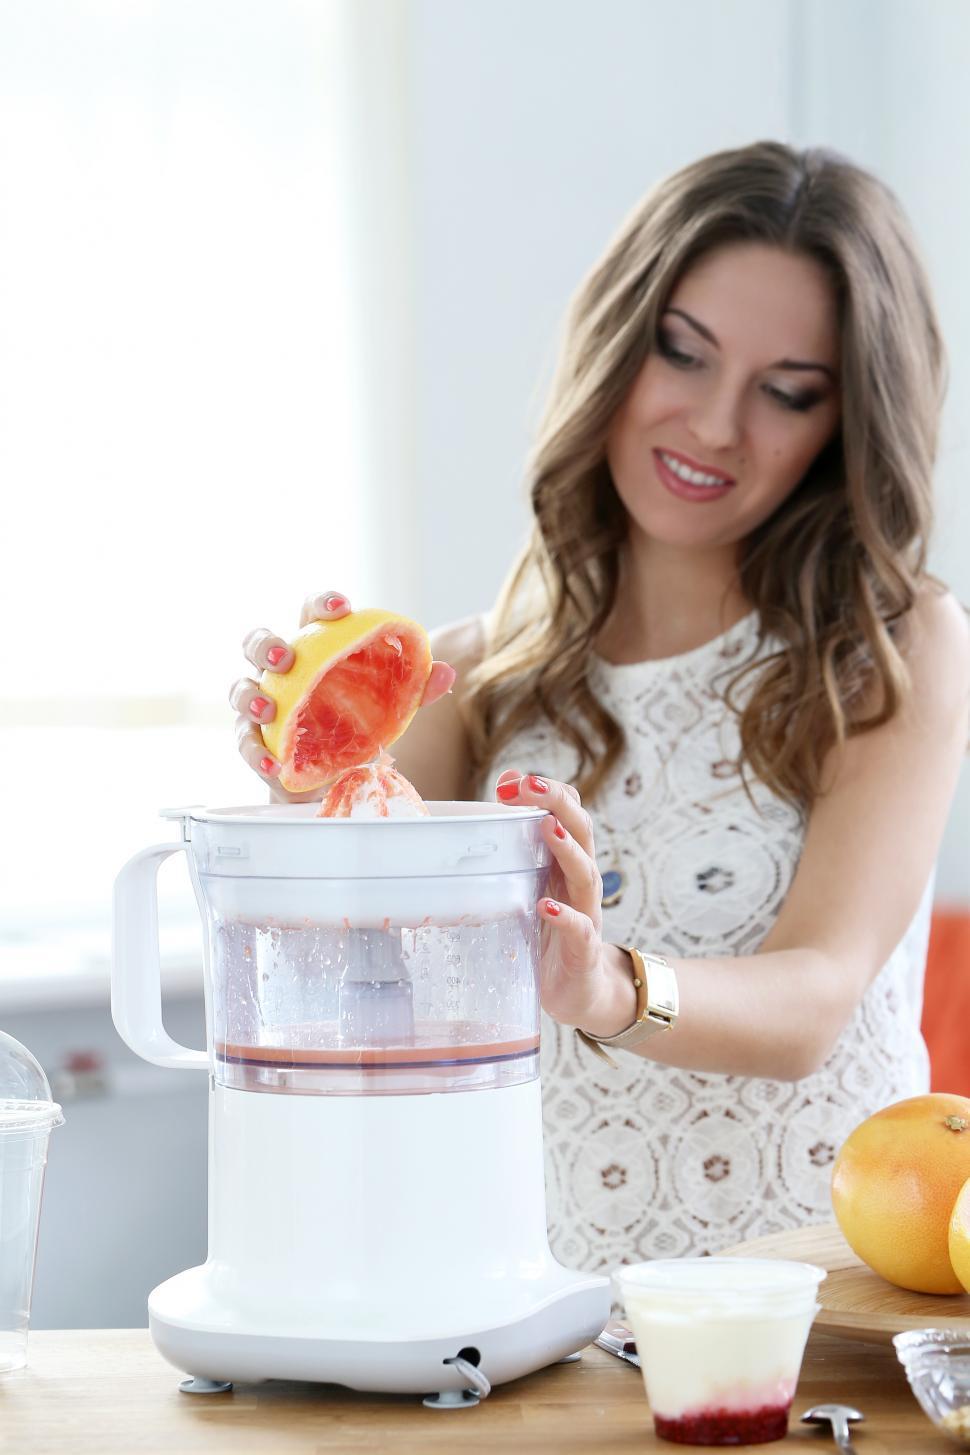 Download Free Stock Photo of Beautiful woman making orange juice